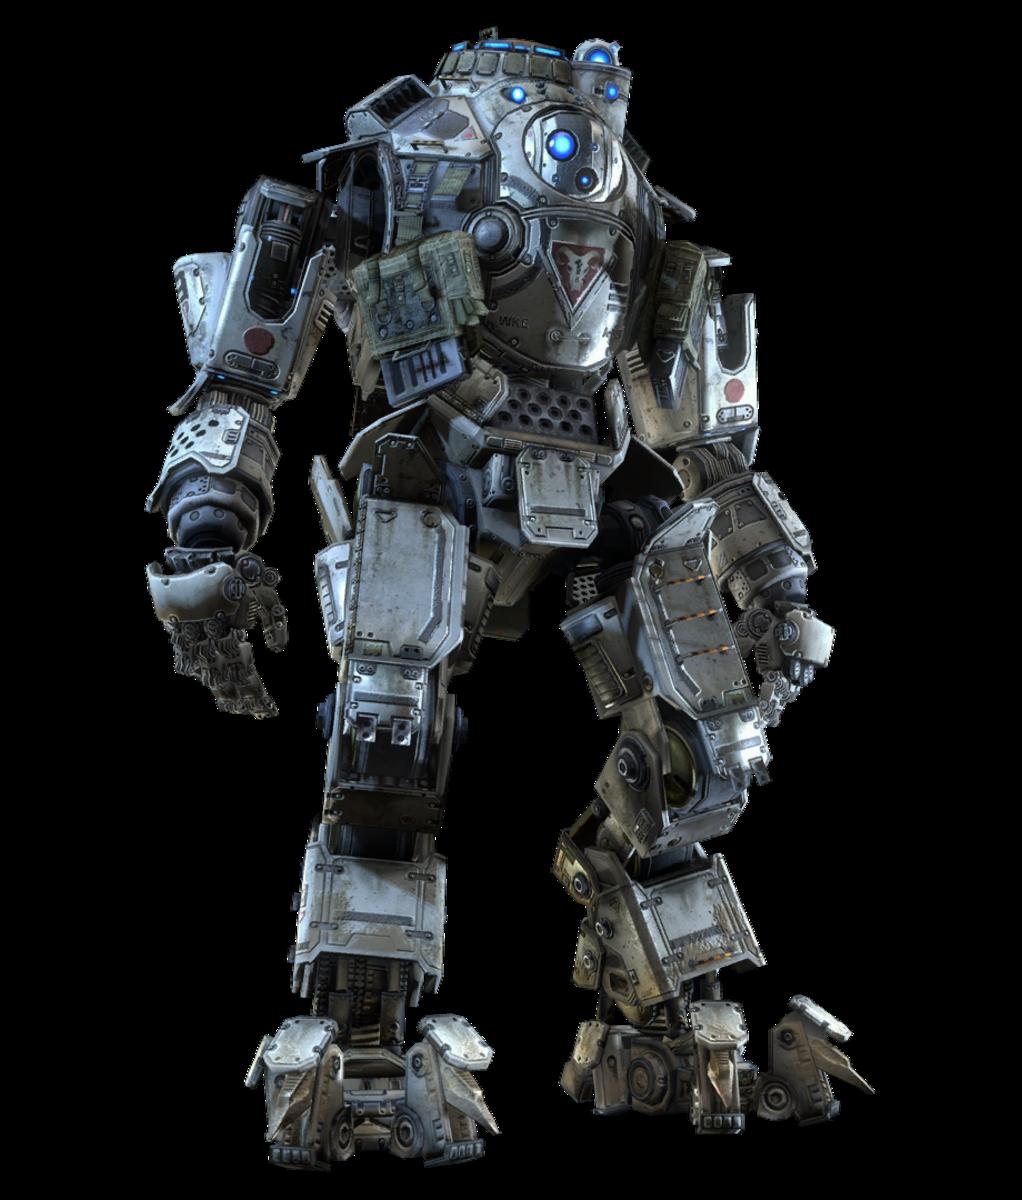 IMC Atlas Titan